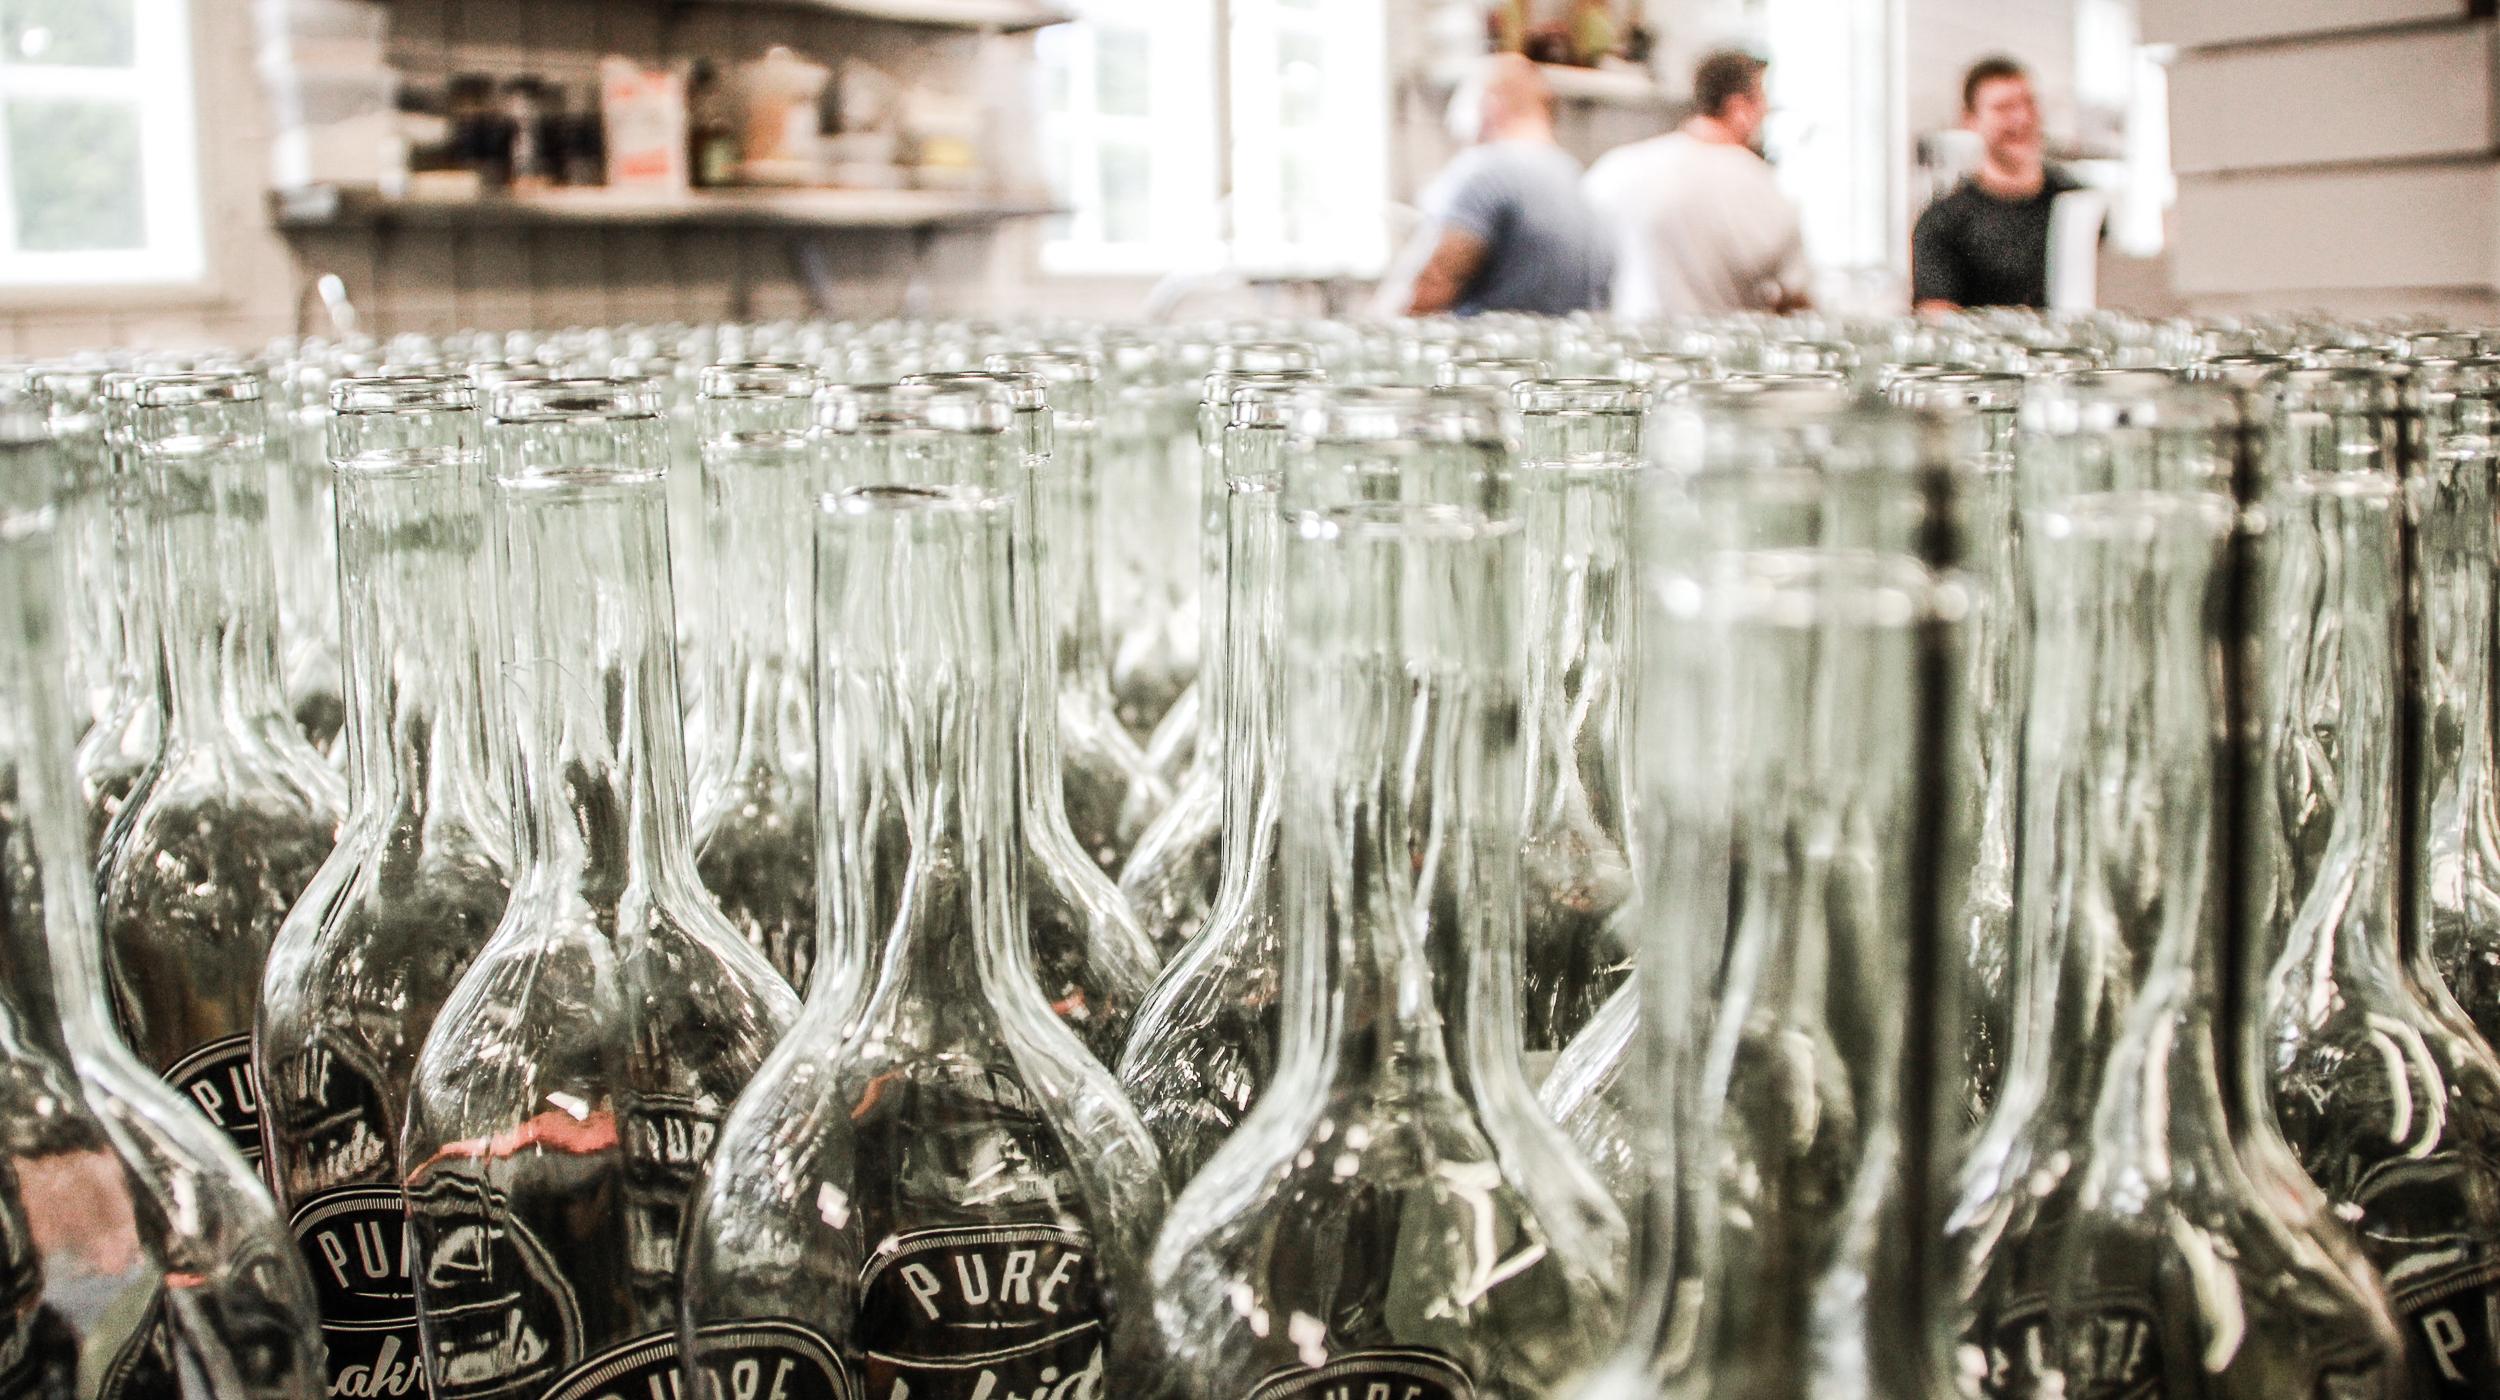 Bottles of Pure Shots on conveyor belt